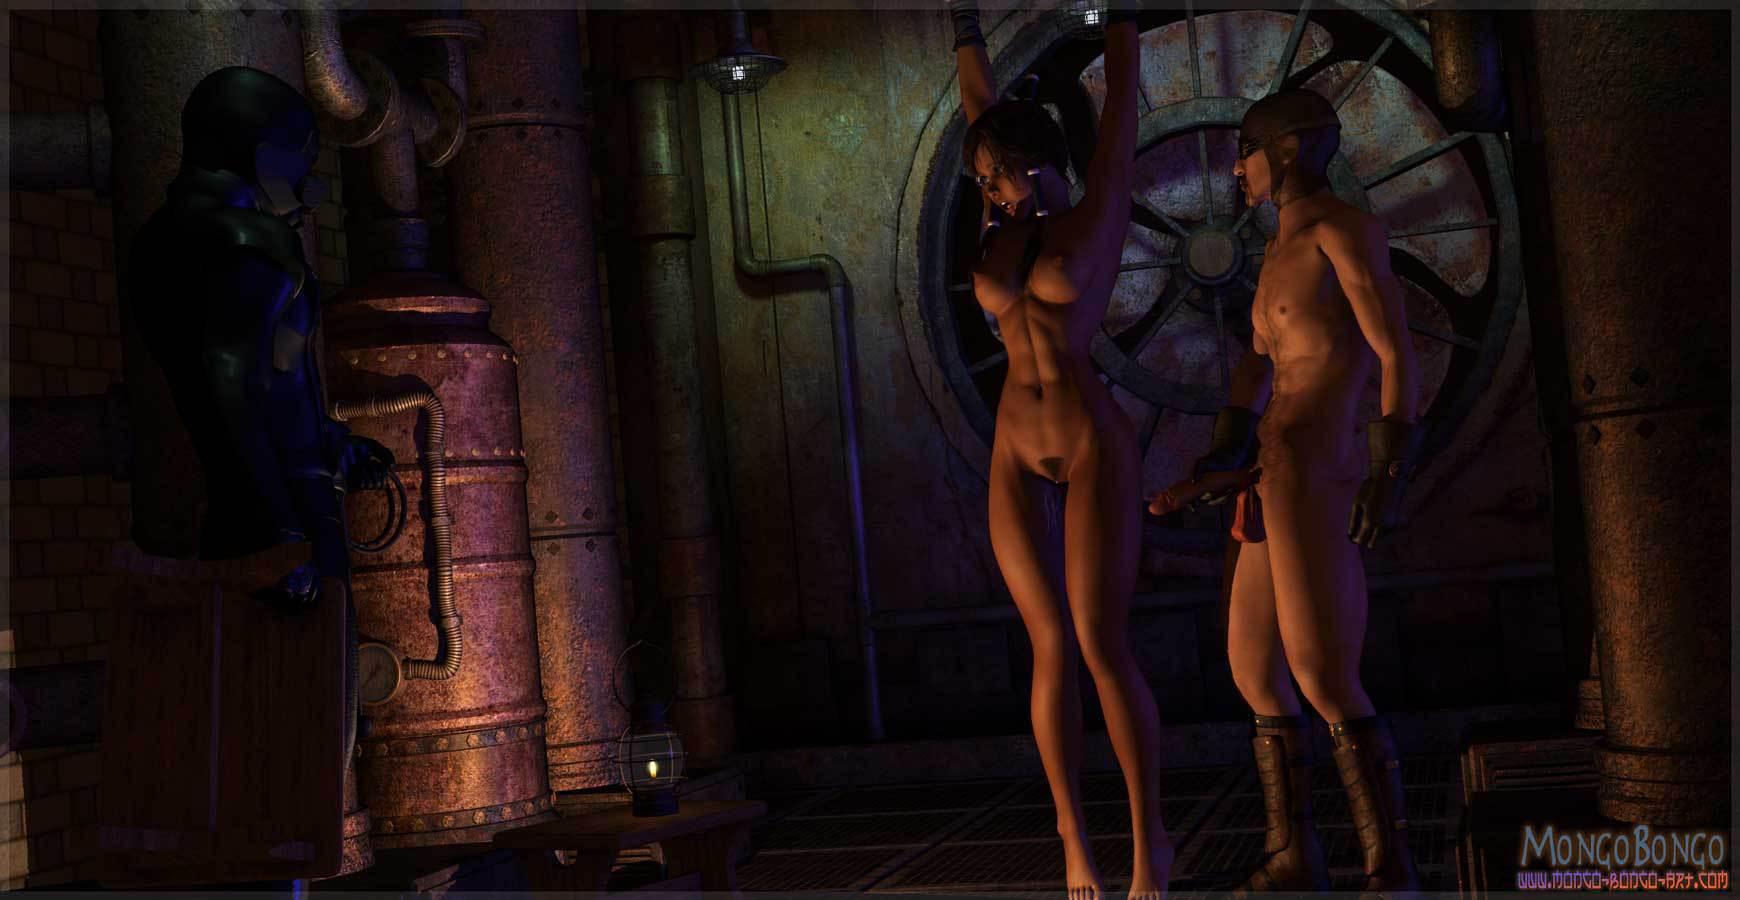 twilight .hack legend ouka of the Rance 01 hikari o motomete the animation